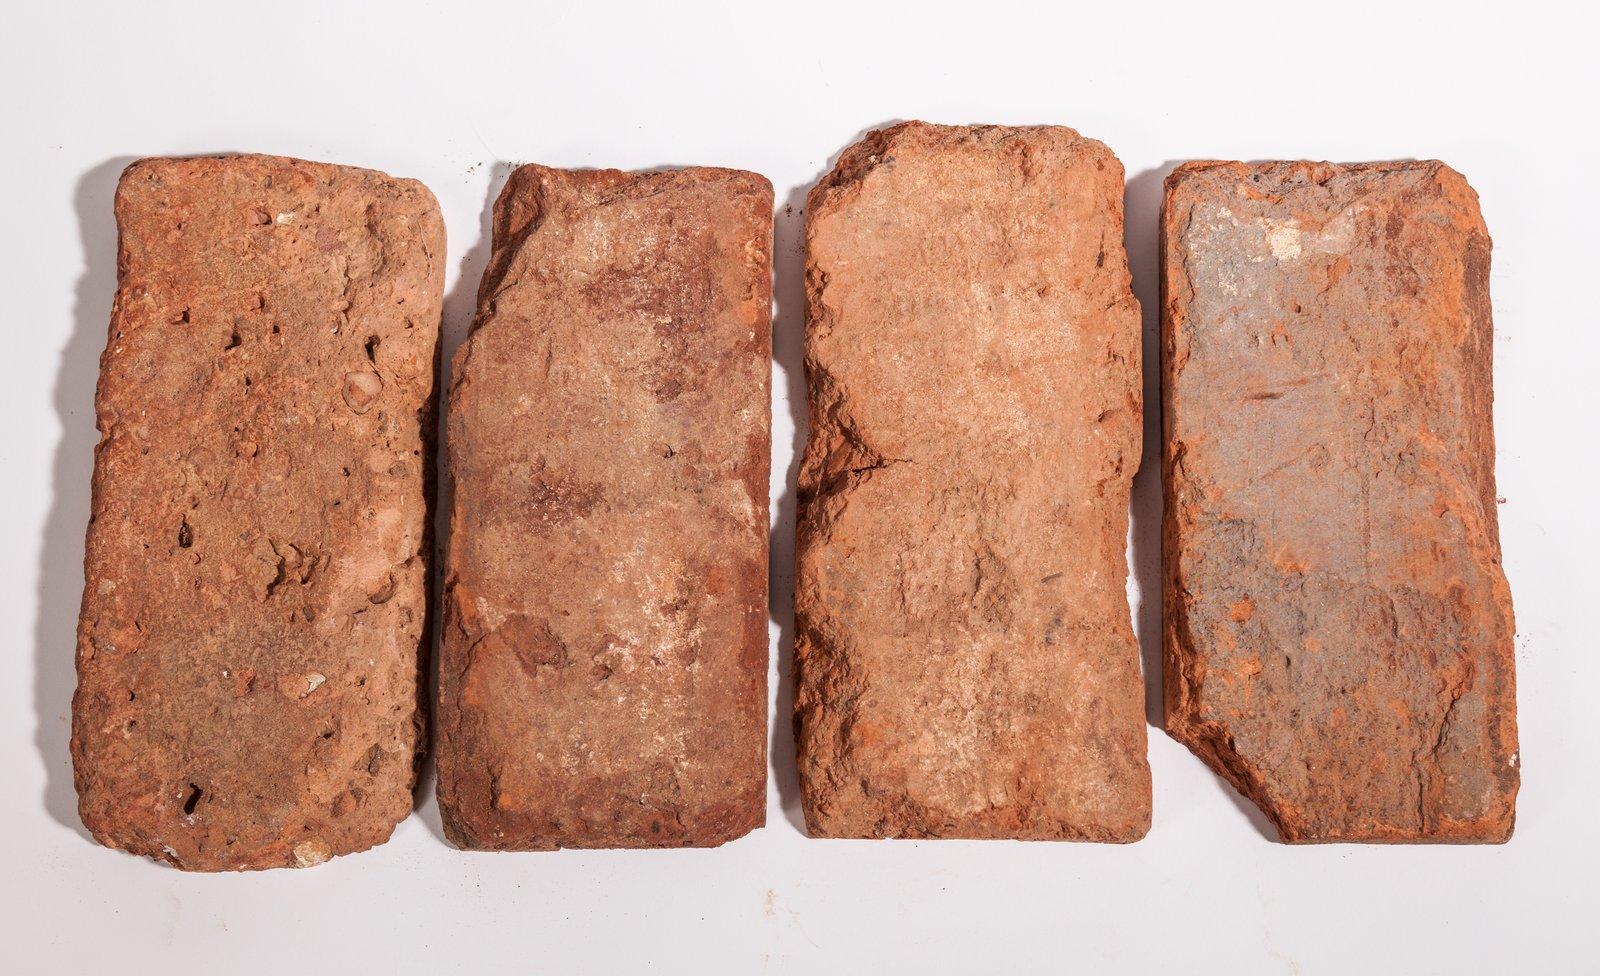 Vintage Bricks thin brick tiles - genuine reclaimed from salvaged bricks www.VintageBricks.com